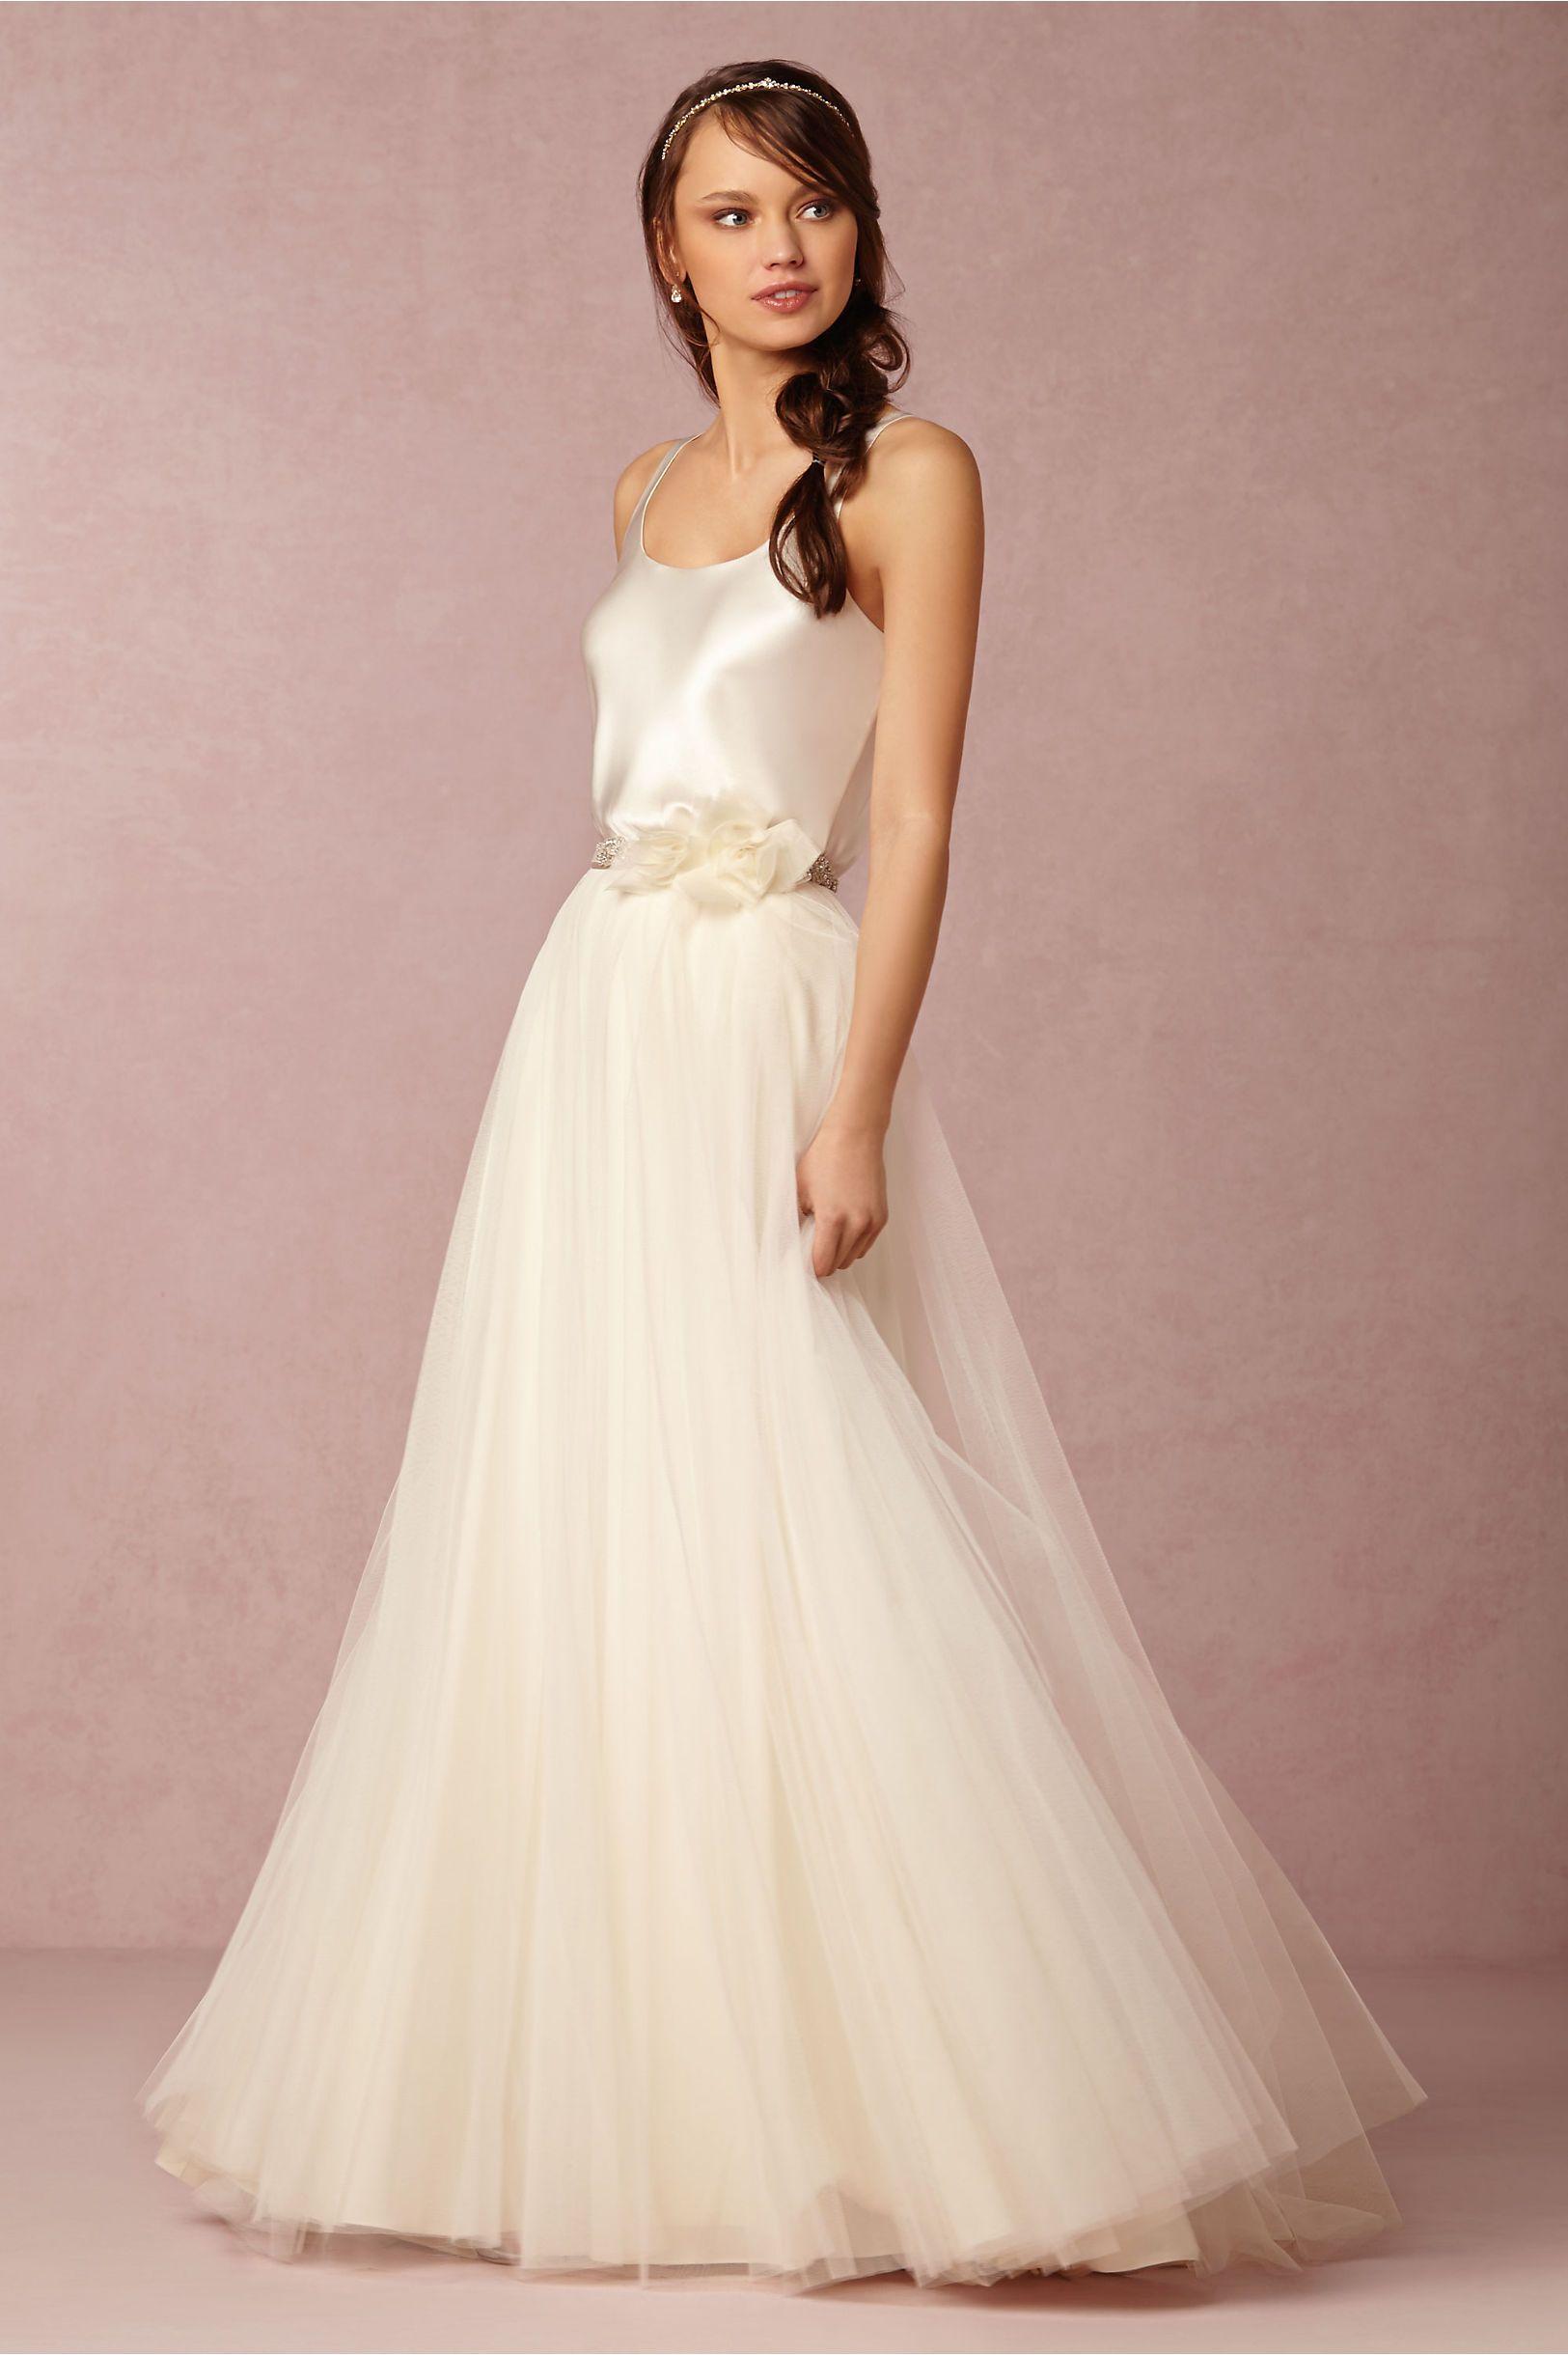 Silk sheath wedding dress  Amaryllis Sash in Sale at BHLDN  Wedding Accessories  Pinterest